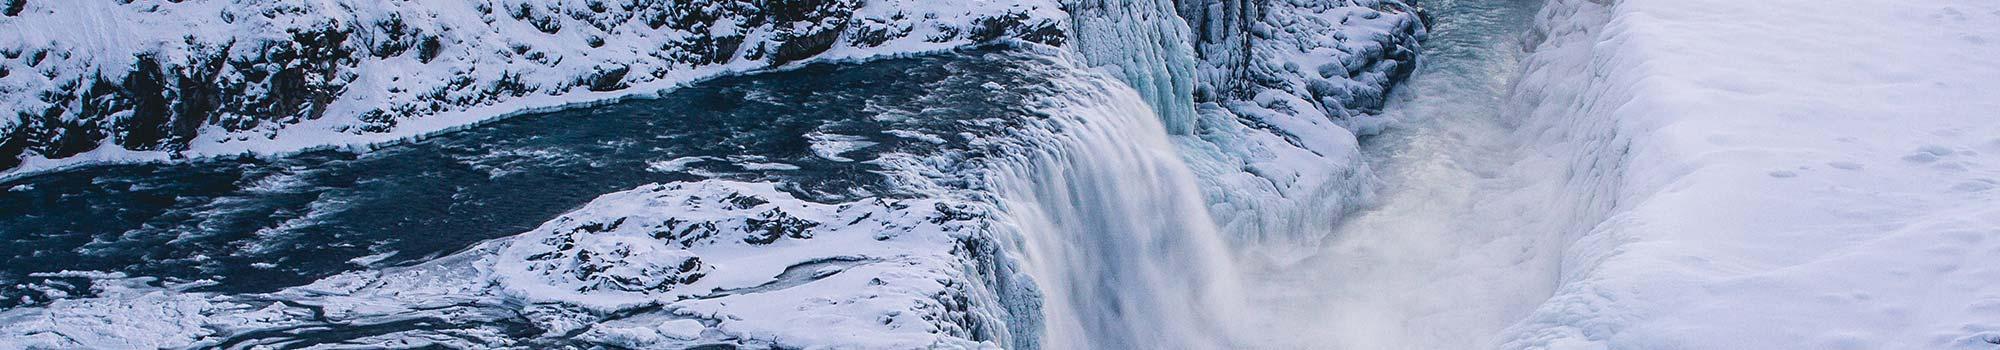 waterfall-icaldn